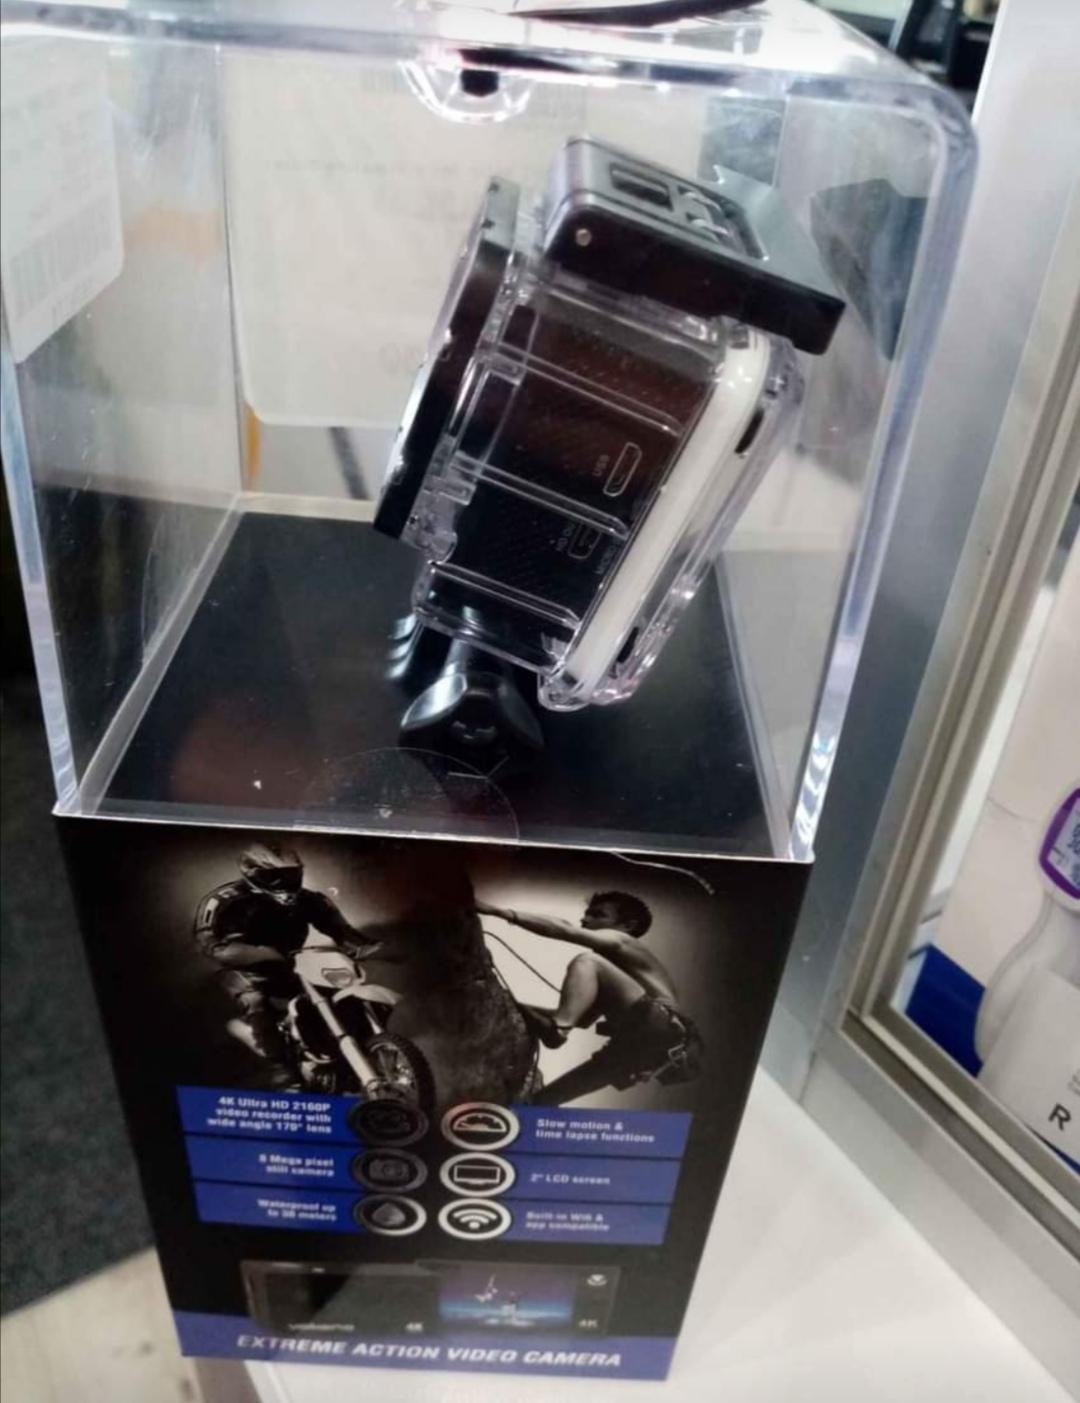 4k UHD Volkano Action Camera